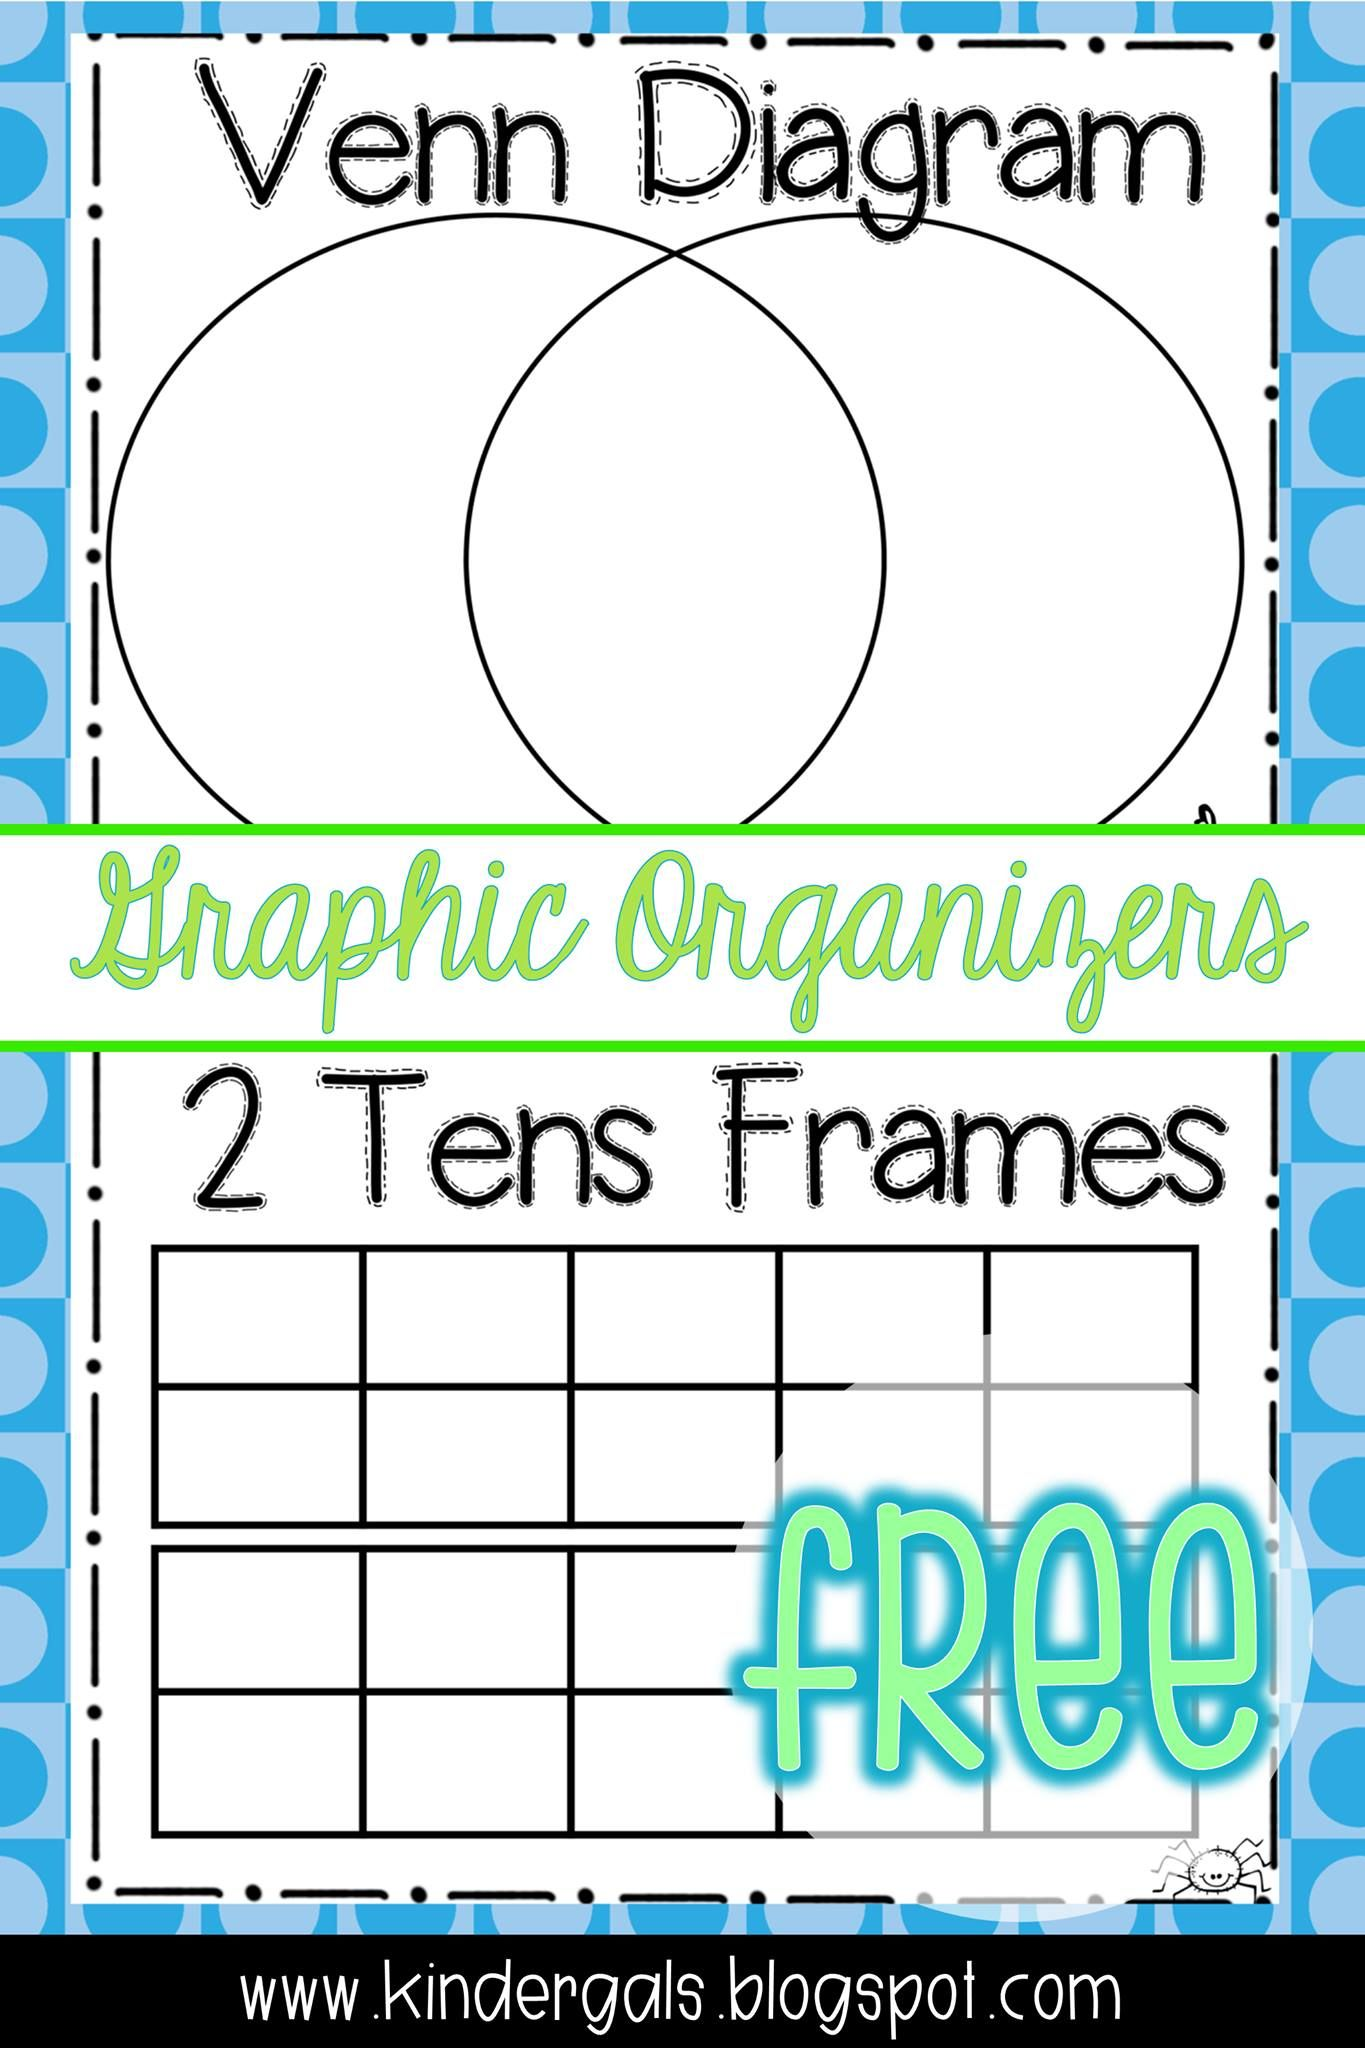 medium resolution of venn diagram and 2 tens frames free downloads for kindergarten teachers